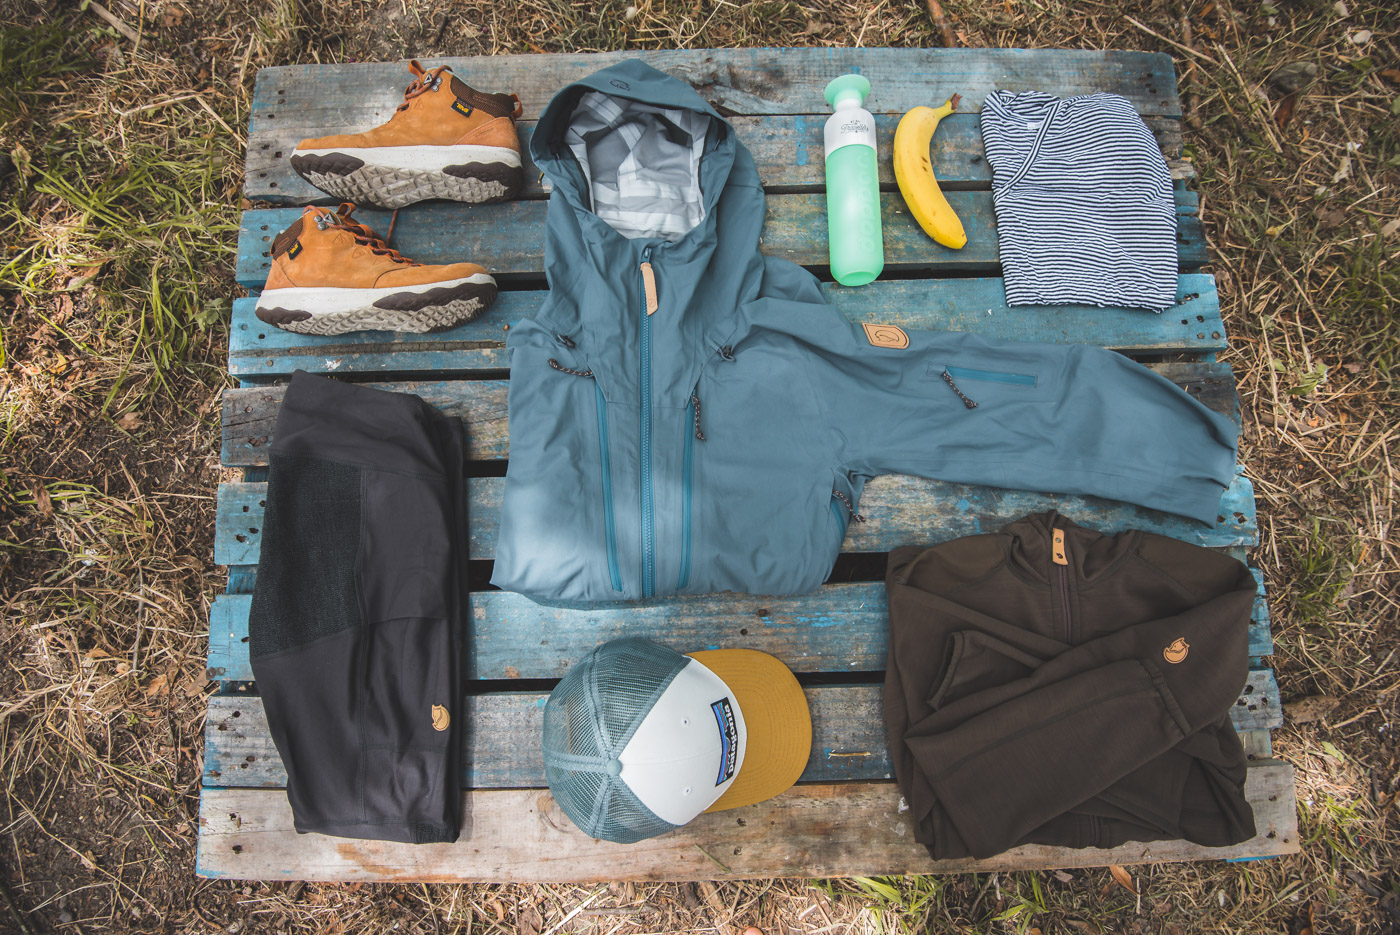 hike kleding paklijst